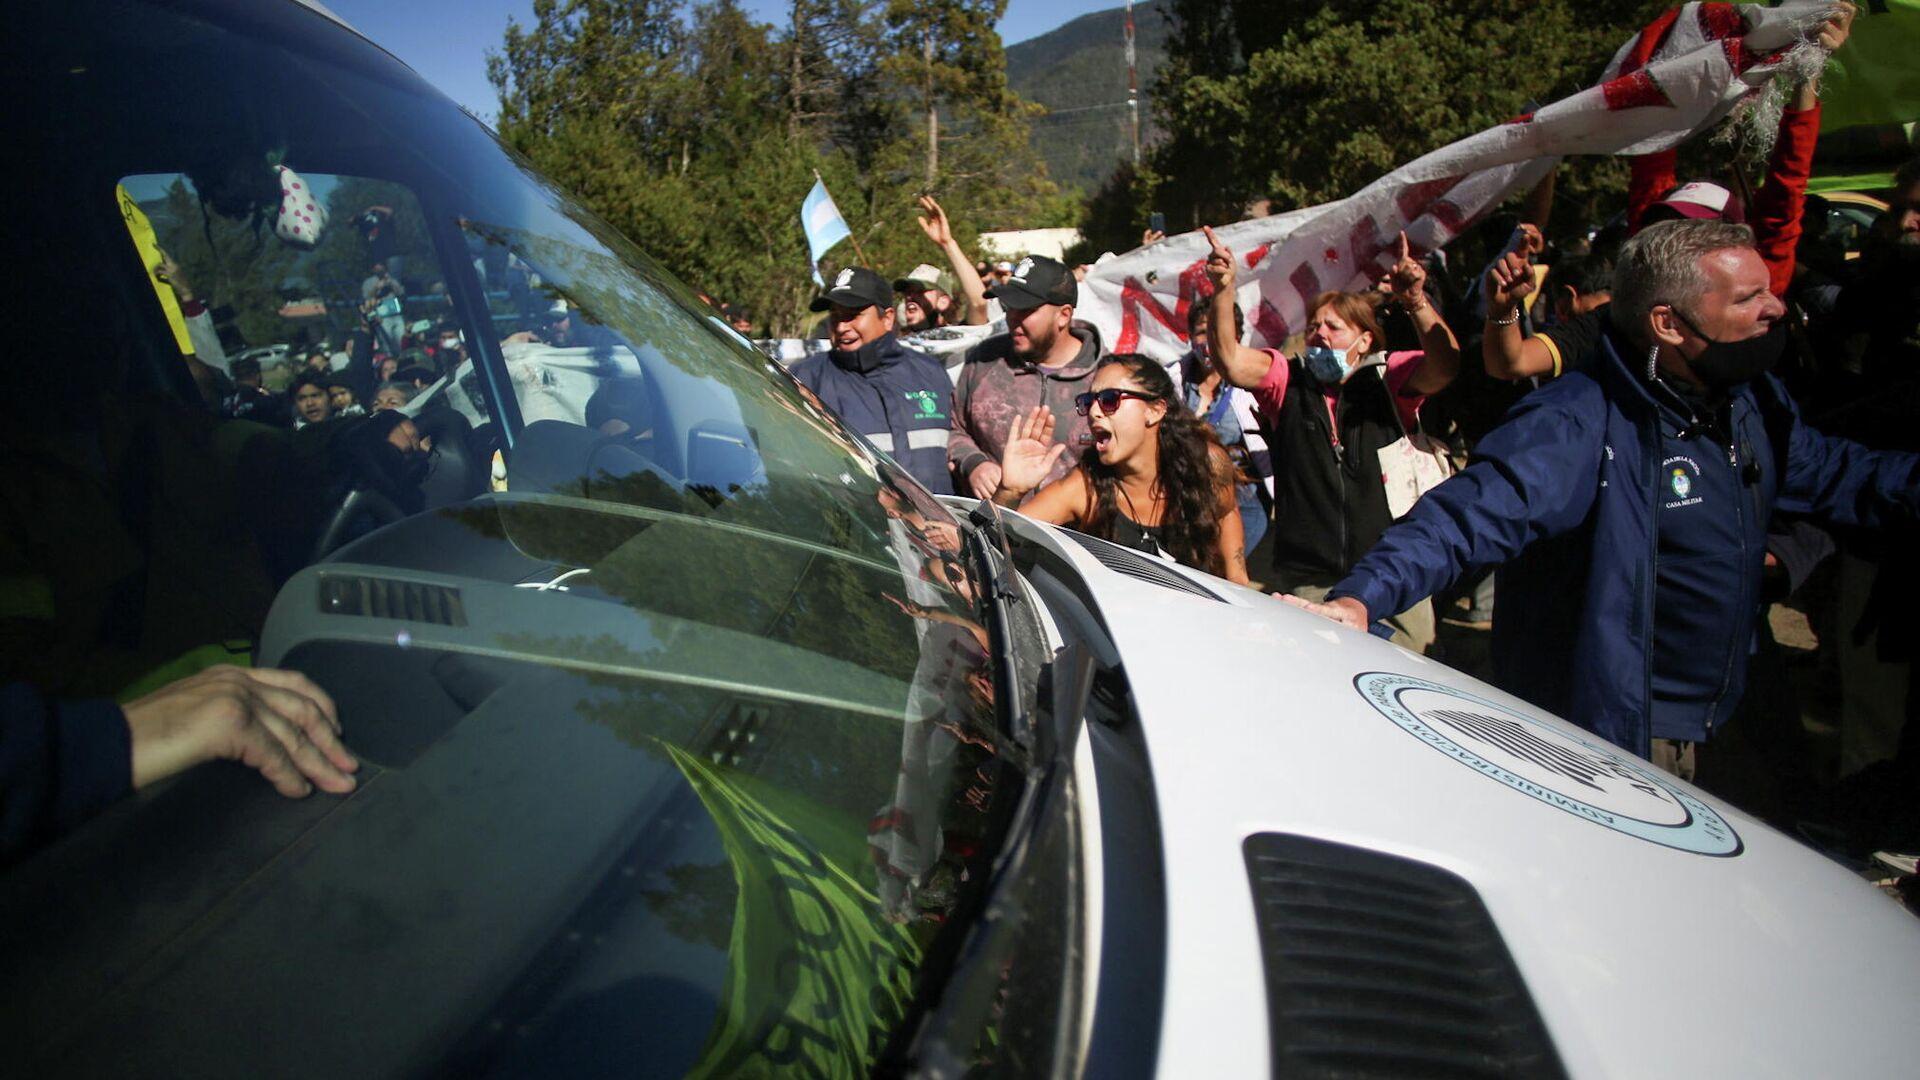 Manifestantes bloquean el paso del coche de Alberto Fernández en Chubut - Sputnik Mundo, 1920, 14.03.2021